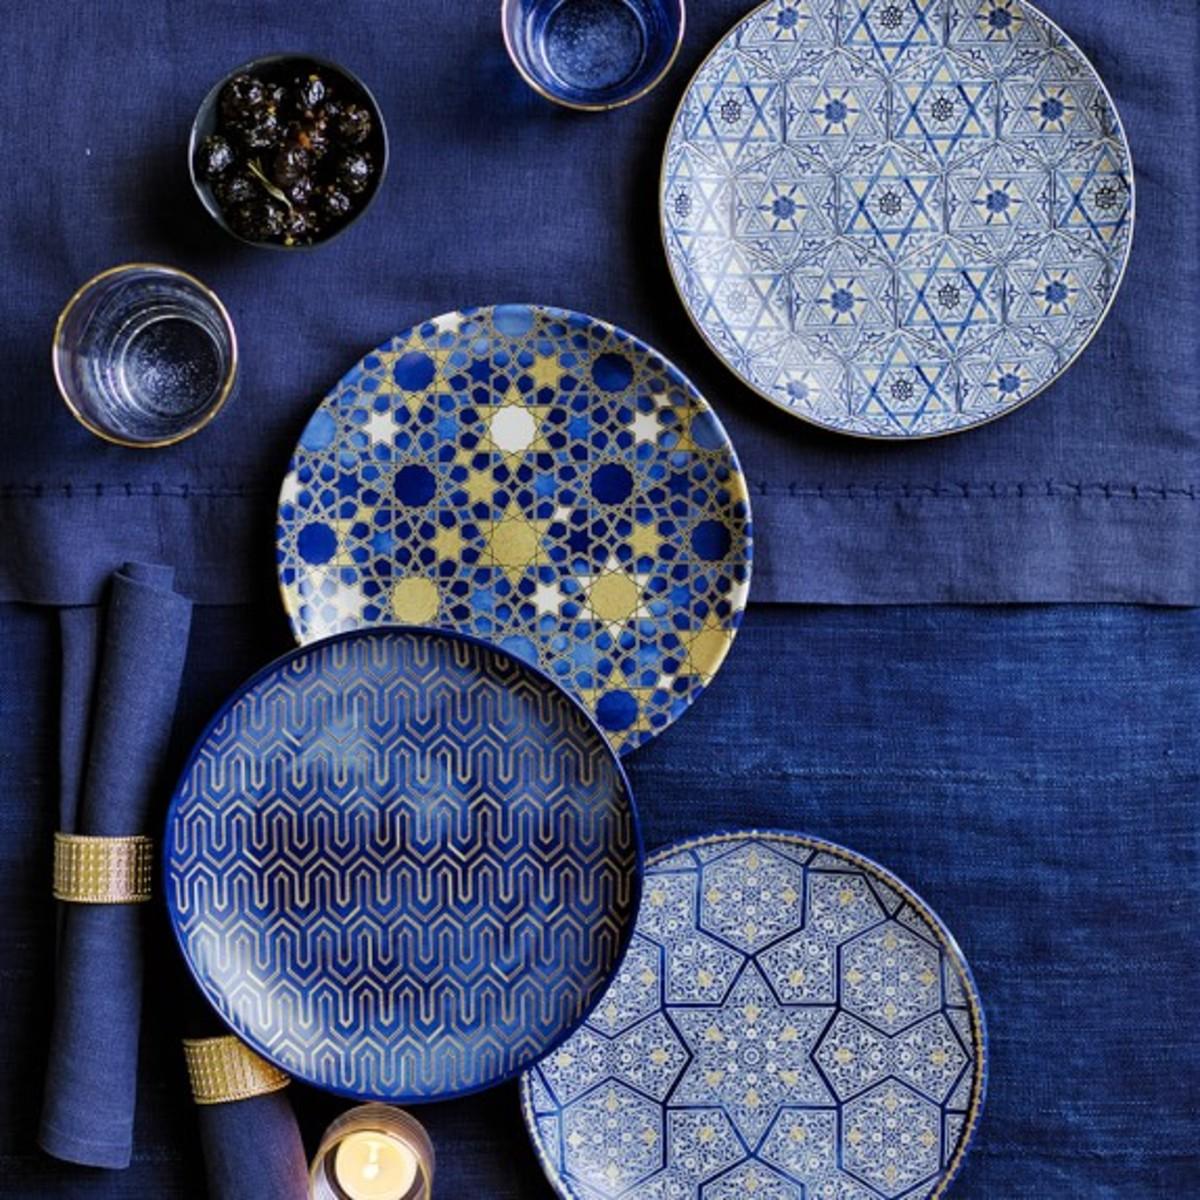 Haukkah plates